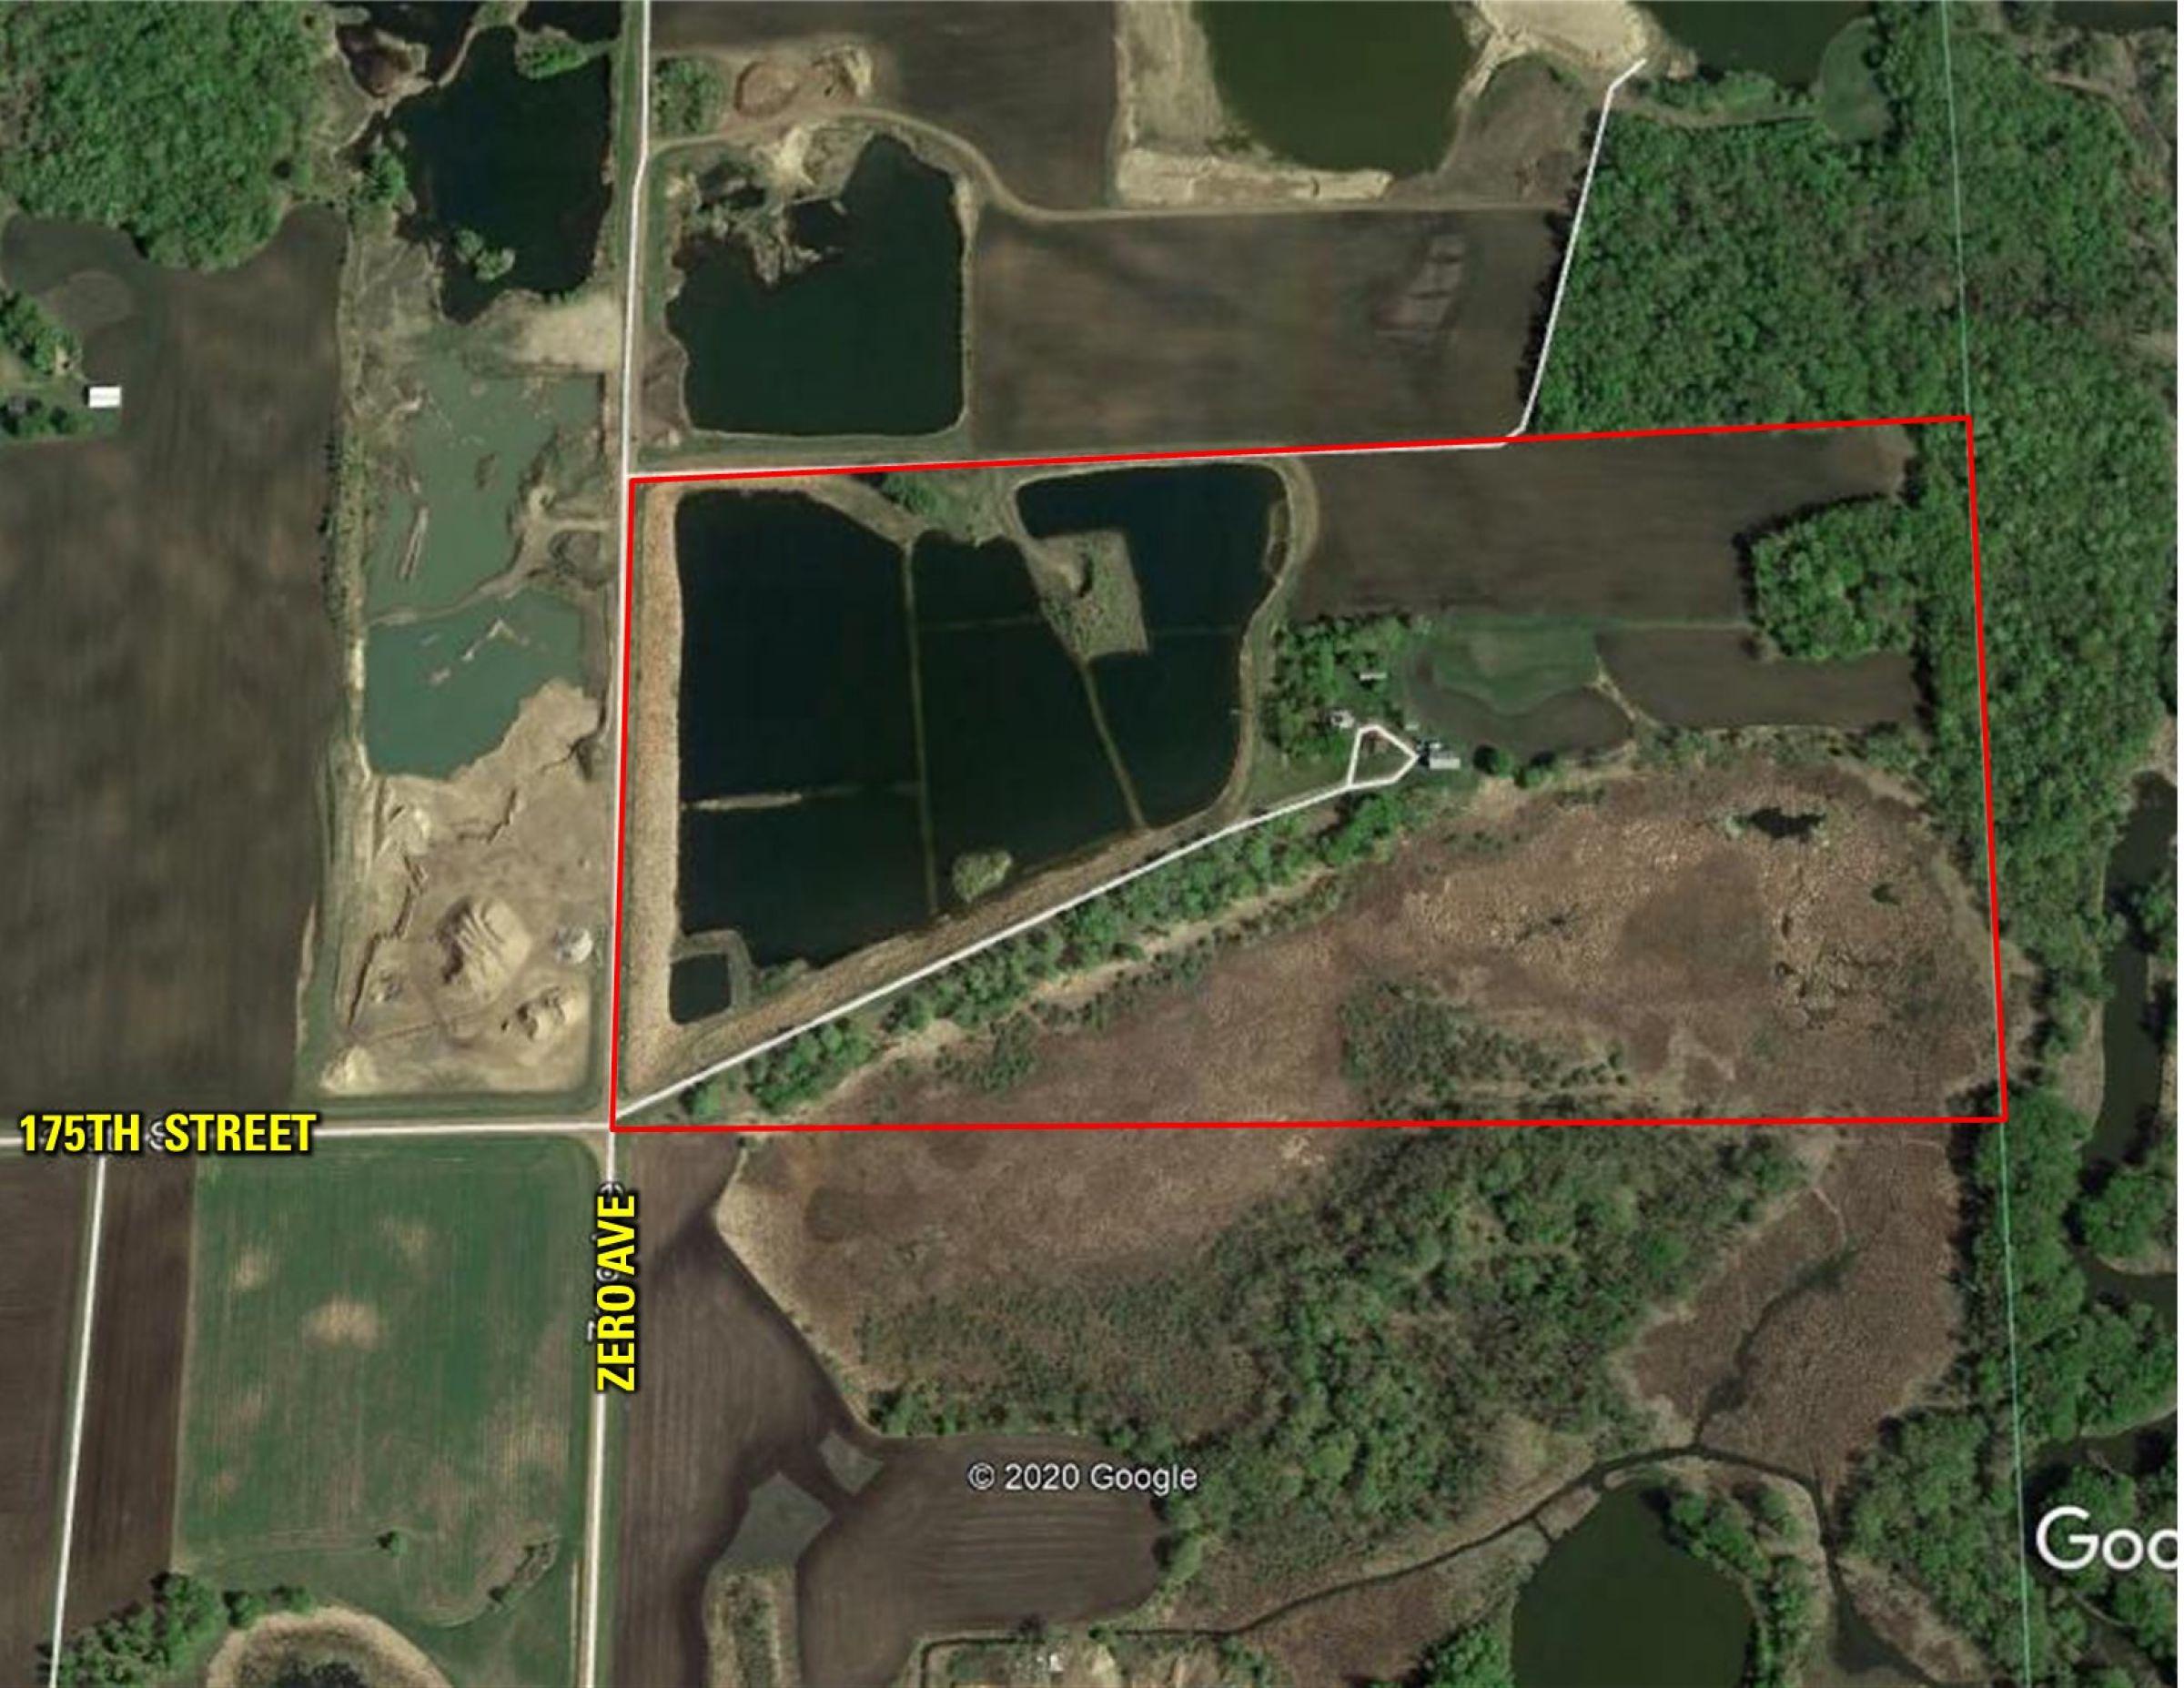 residential-land-mcleod-county-minnesota-80-acres-listing-number-15182-0-2020-09-23-165840.jpg